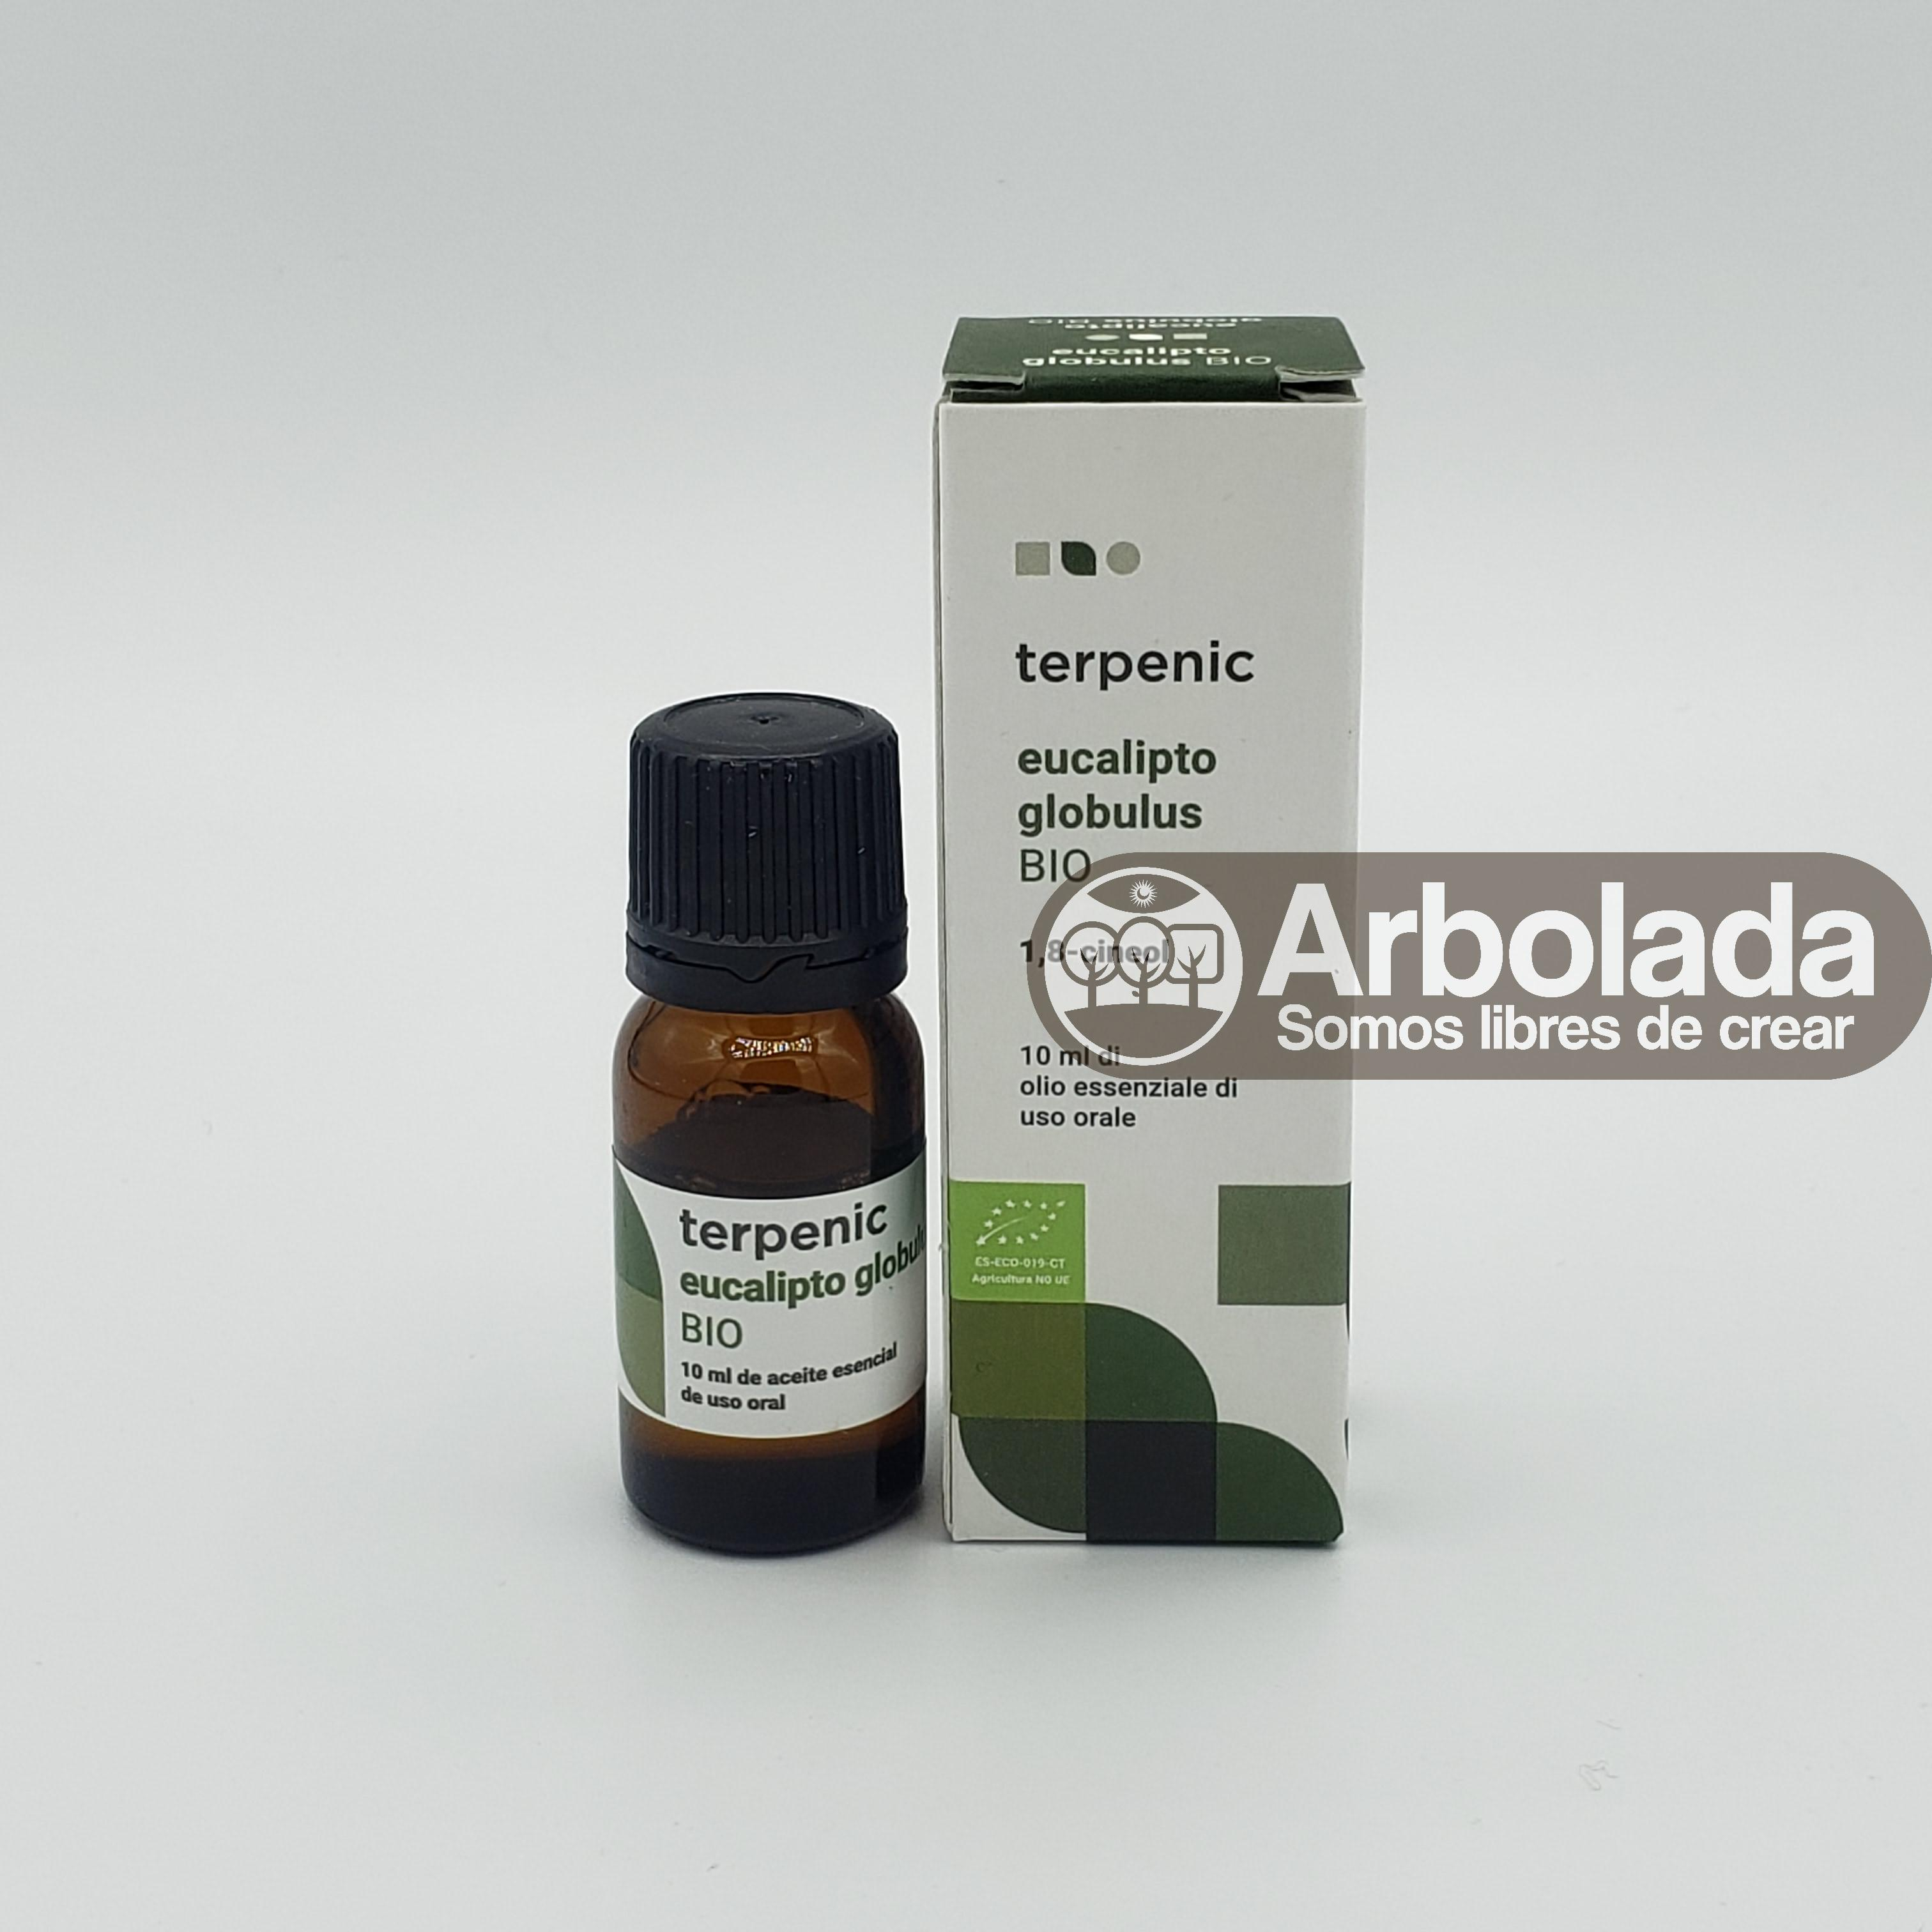 Eucaliptus Globulus BIO Terpenic 10ml